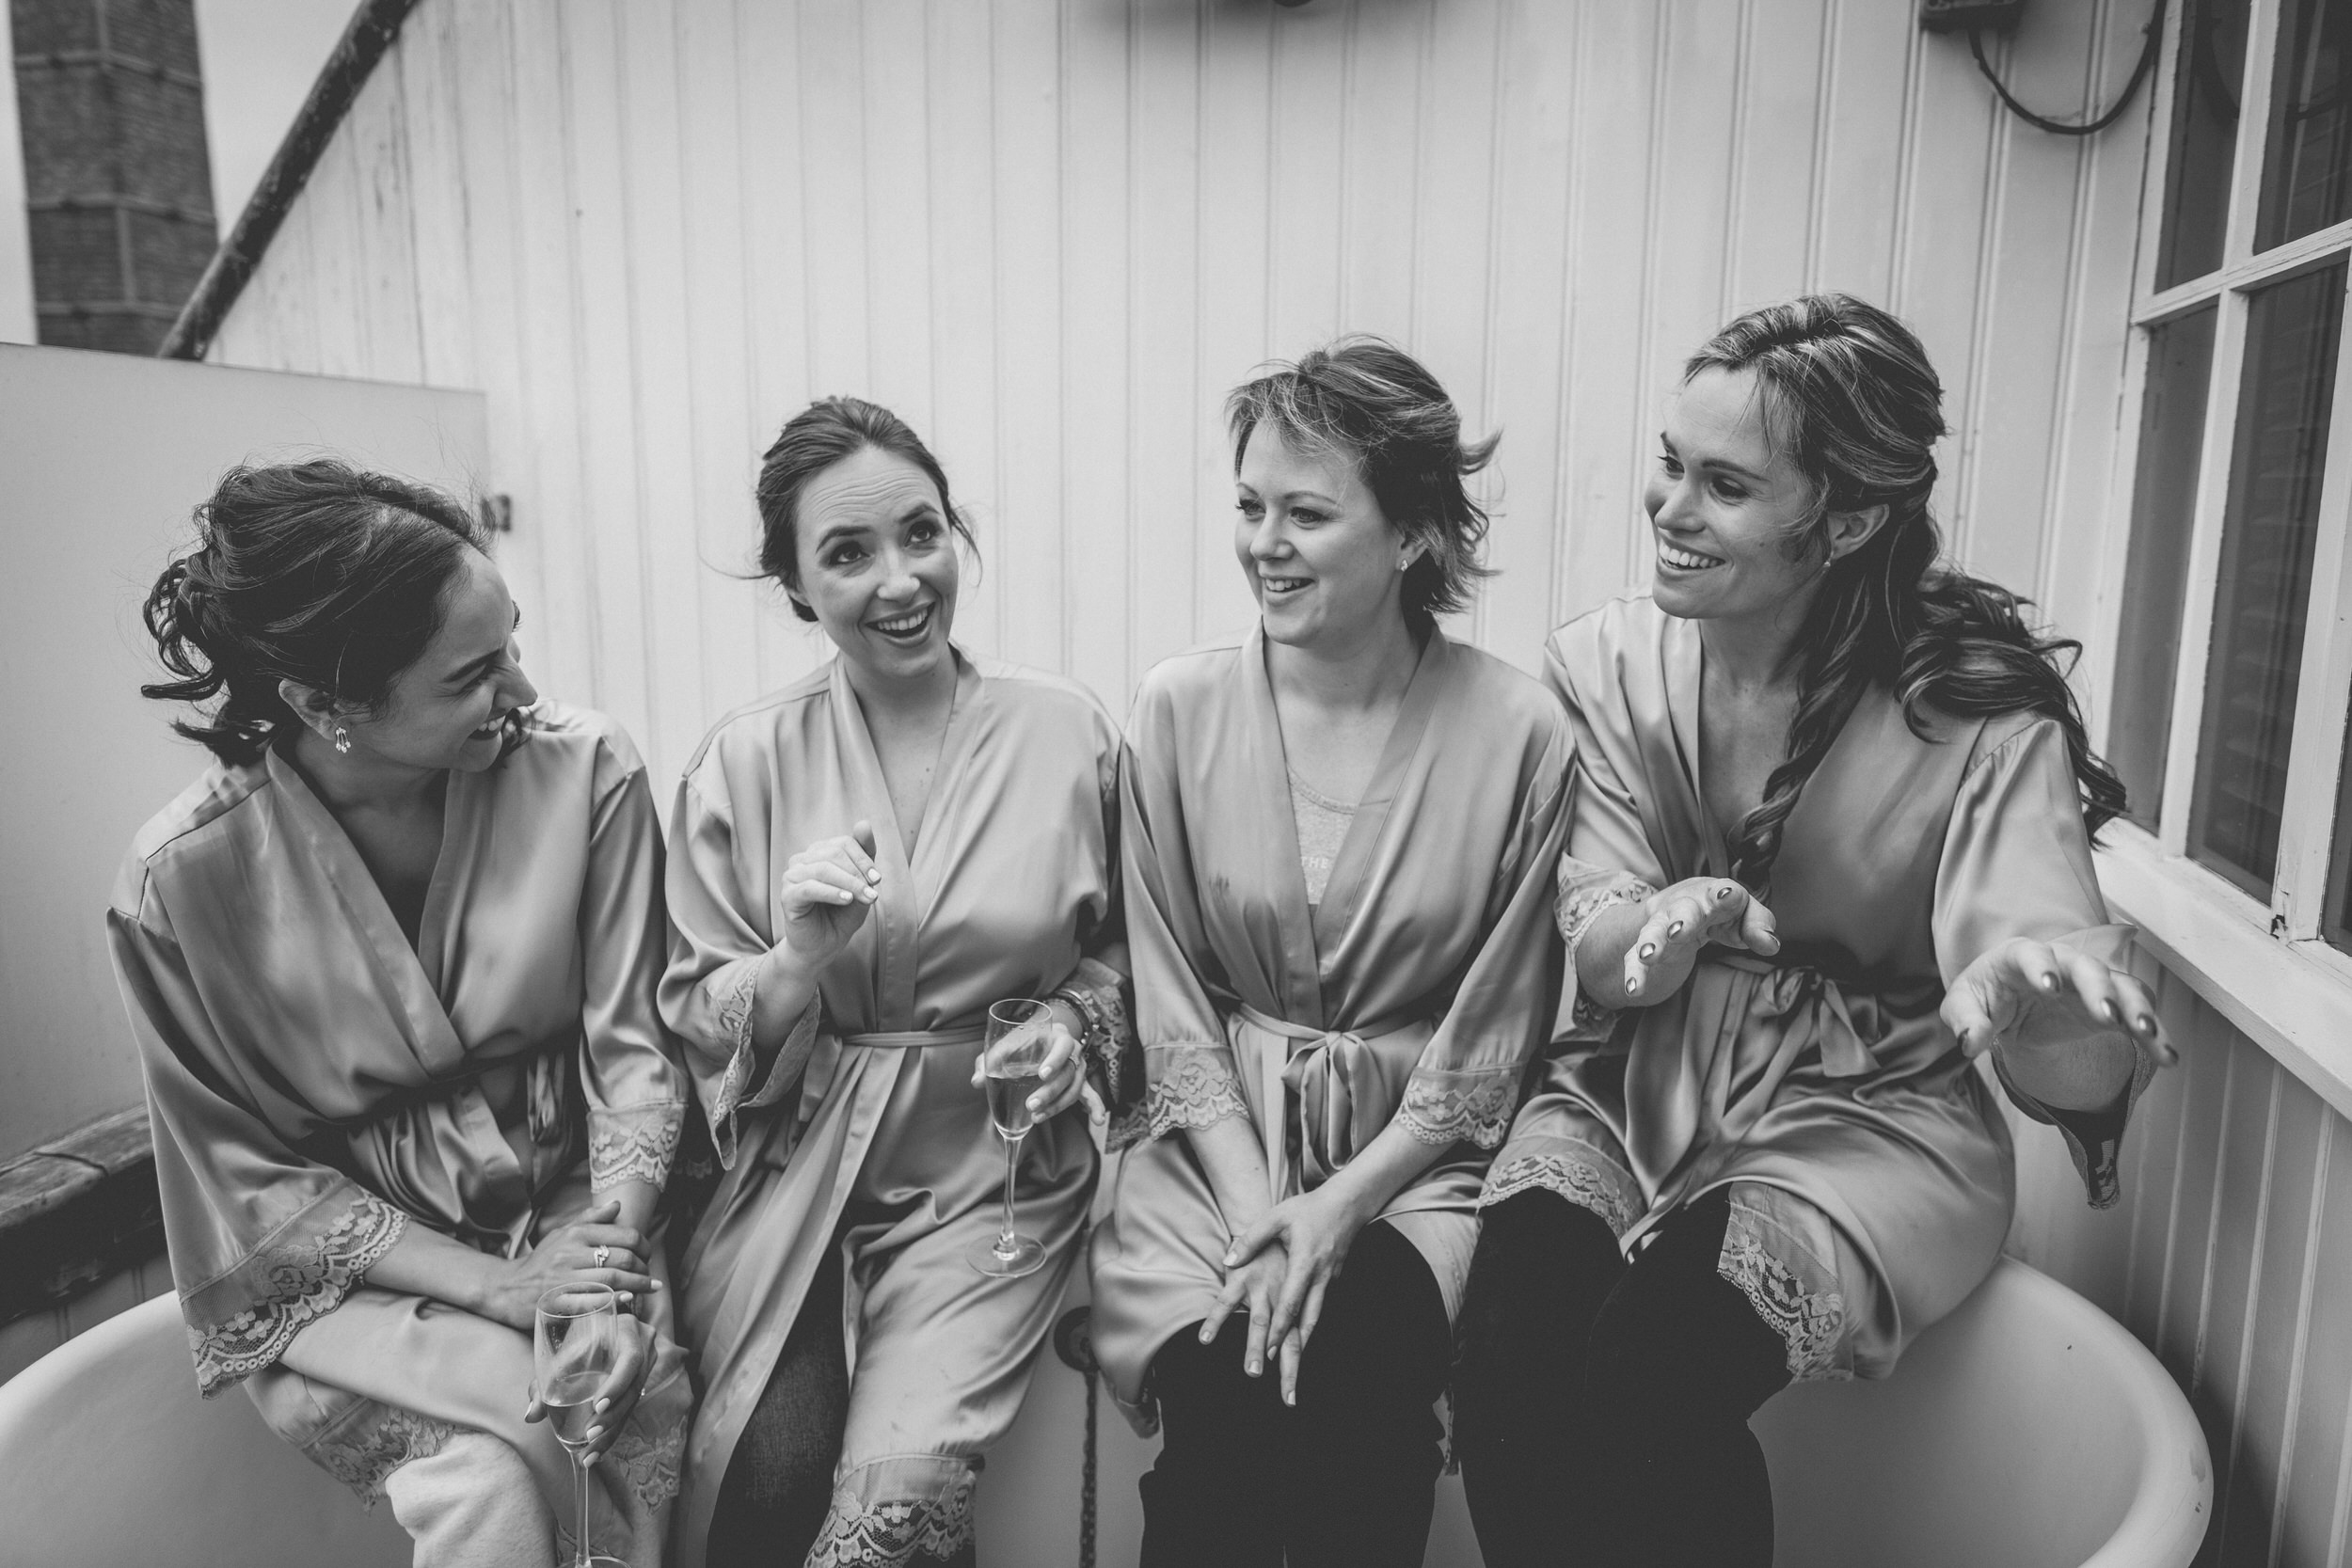 bridesmaids in a bathtub